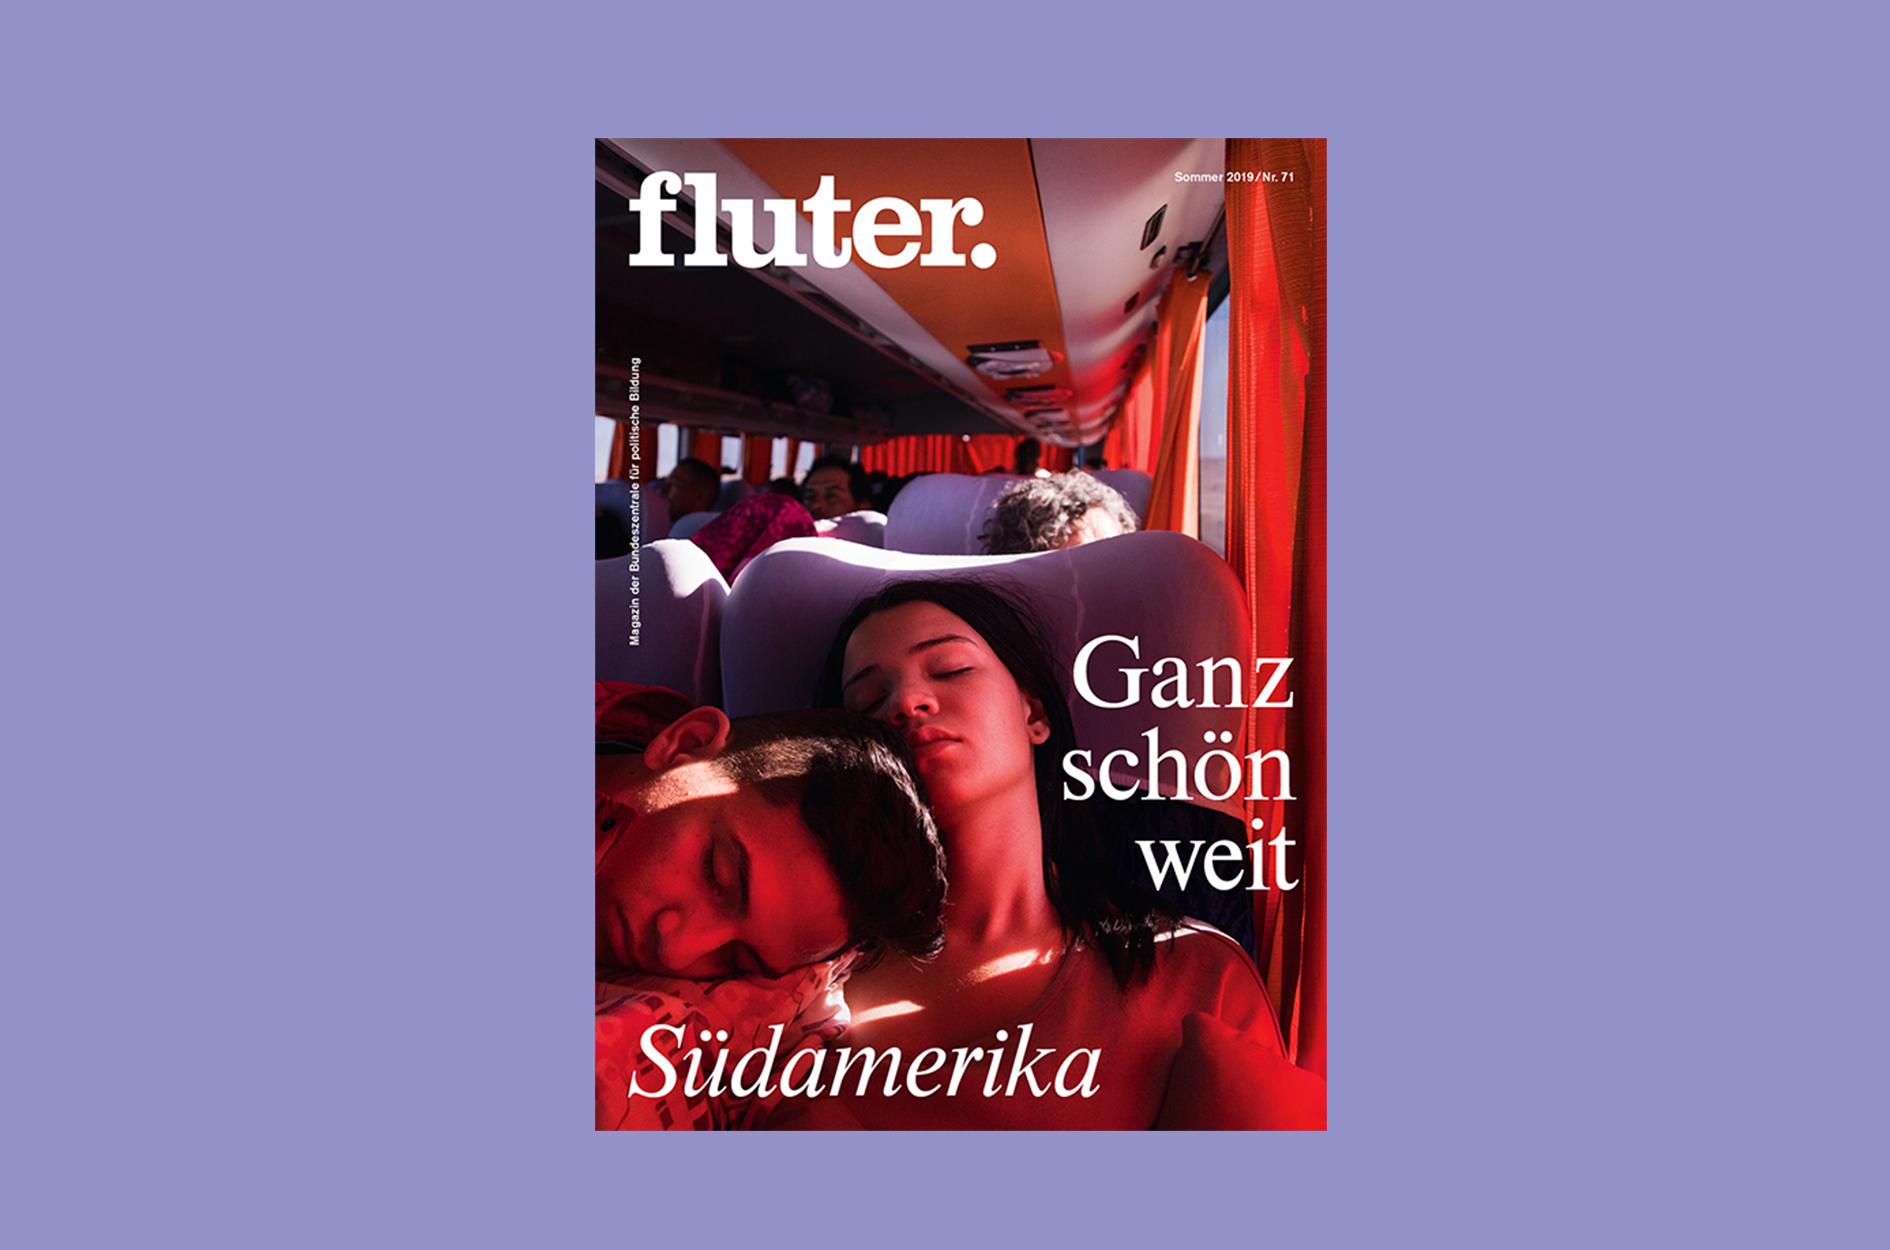 fluter 70 Suedamerika